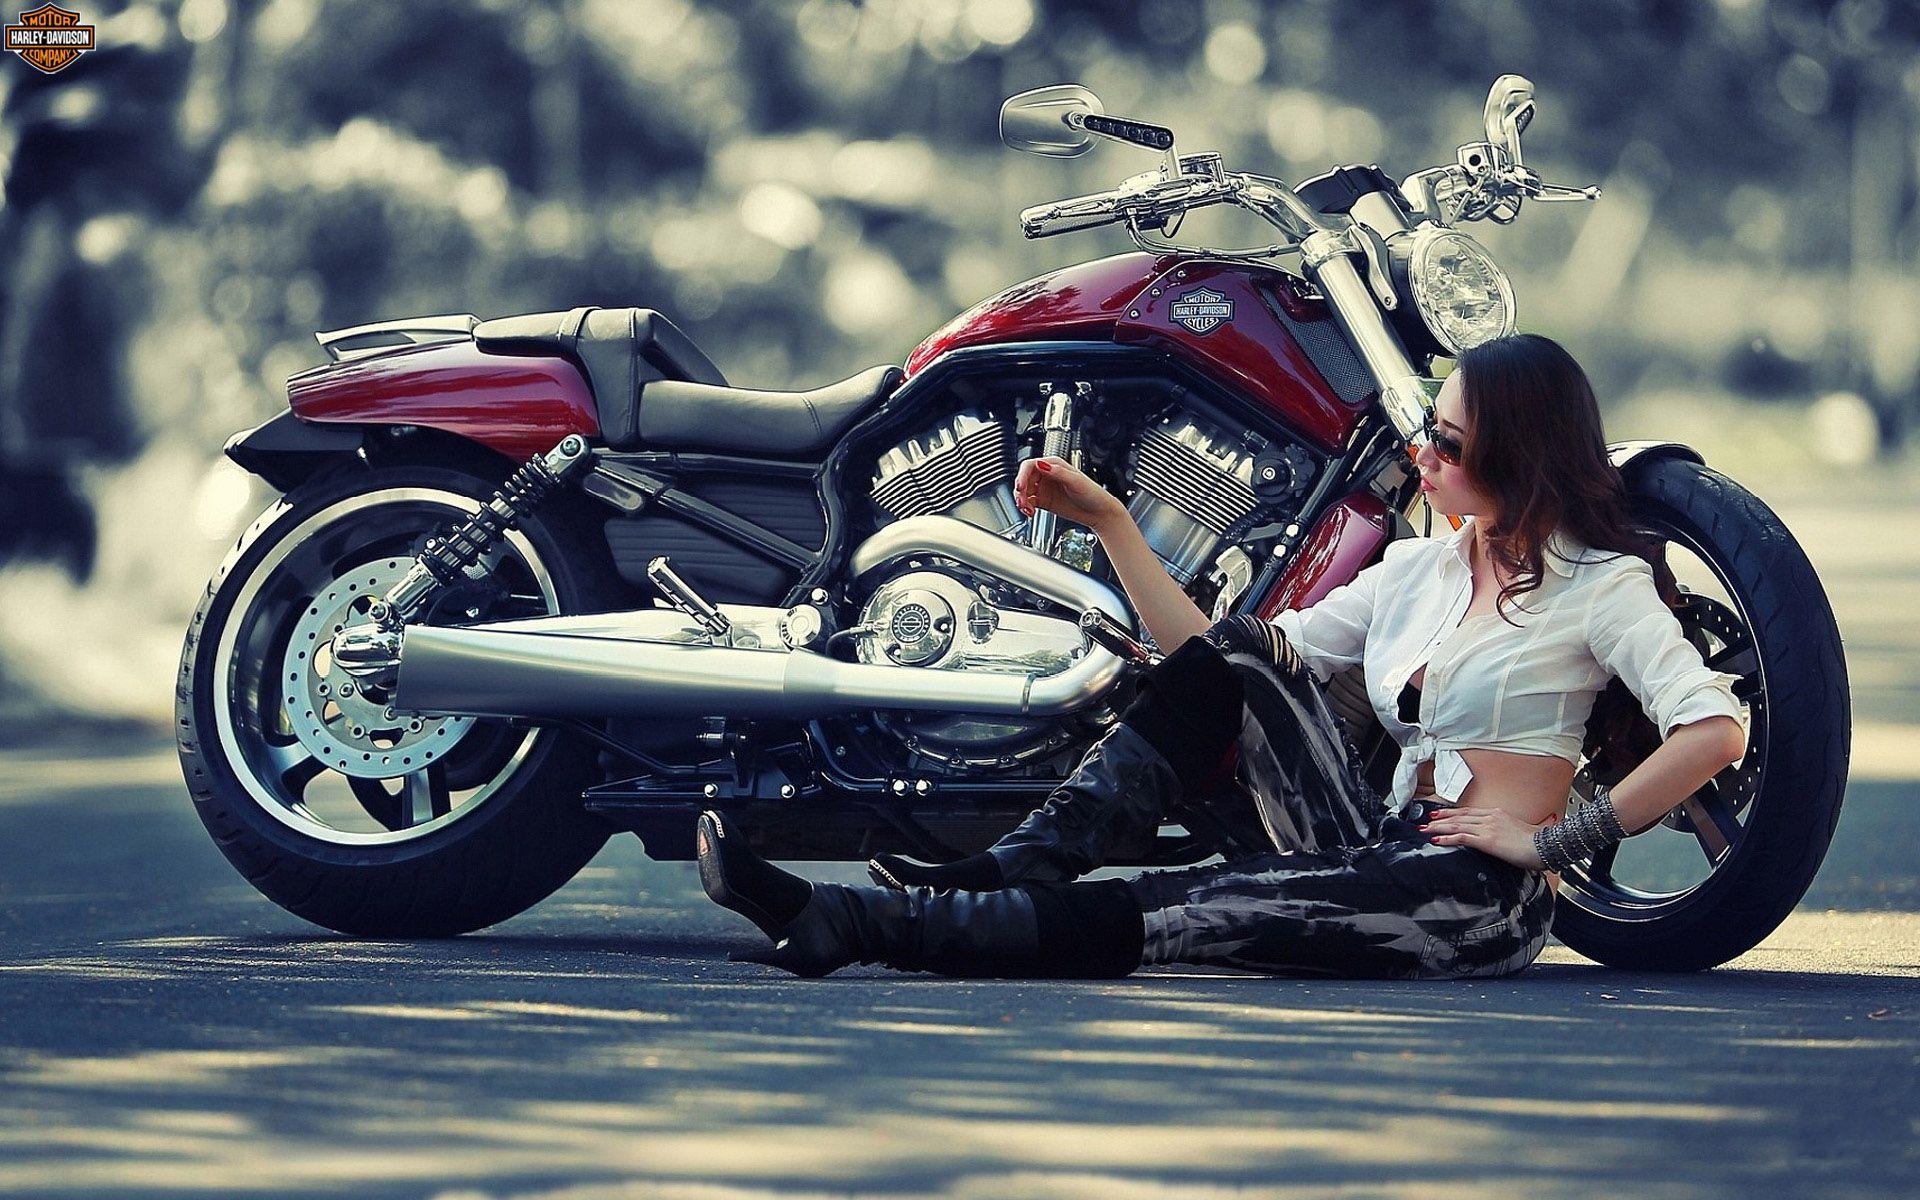 Harley Davidson Best Wallpapers Harley Davidson Wallpaper Harley Davidson Motorcycle Wallpaper